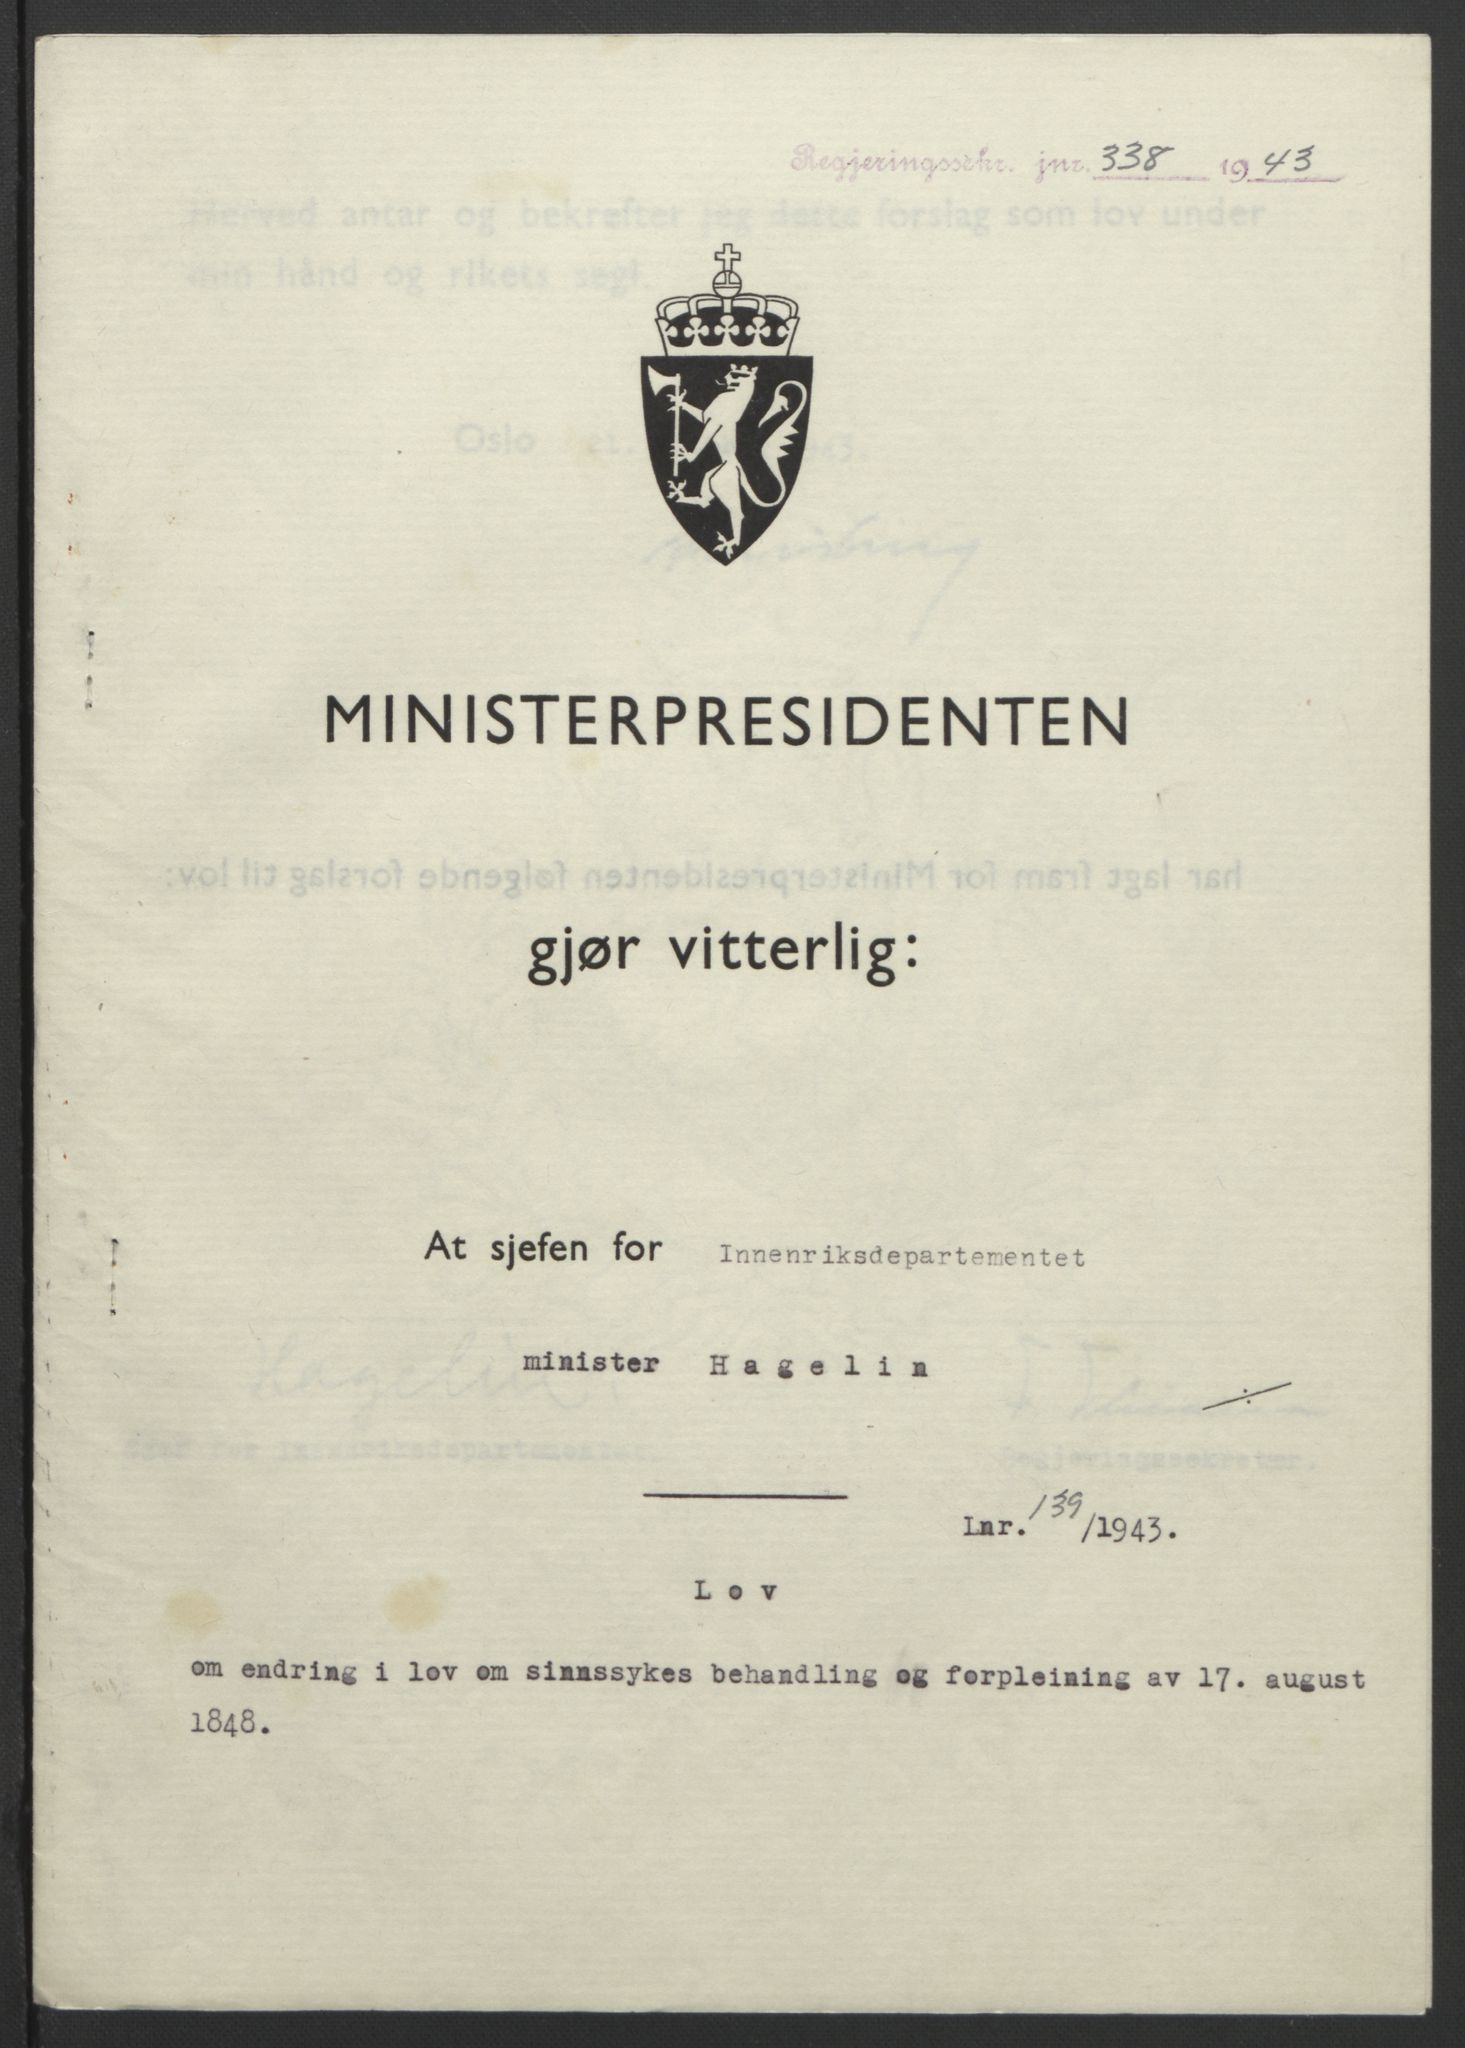 RA, NS-administrasjonen 1940-1945 (Statsrådsekretariatet, de kommisariske statsråder mm), D/Db/L0099: Lover, 1943, s. 648